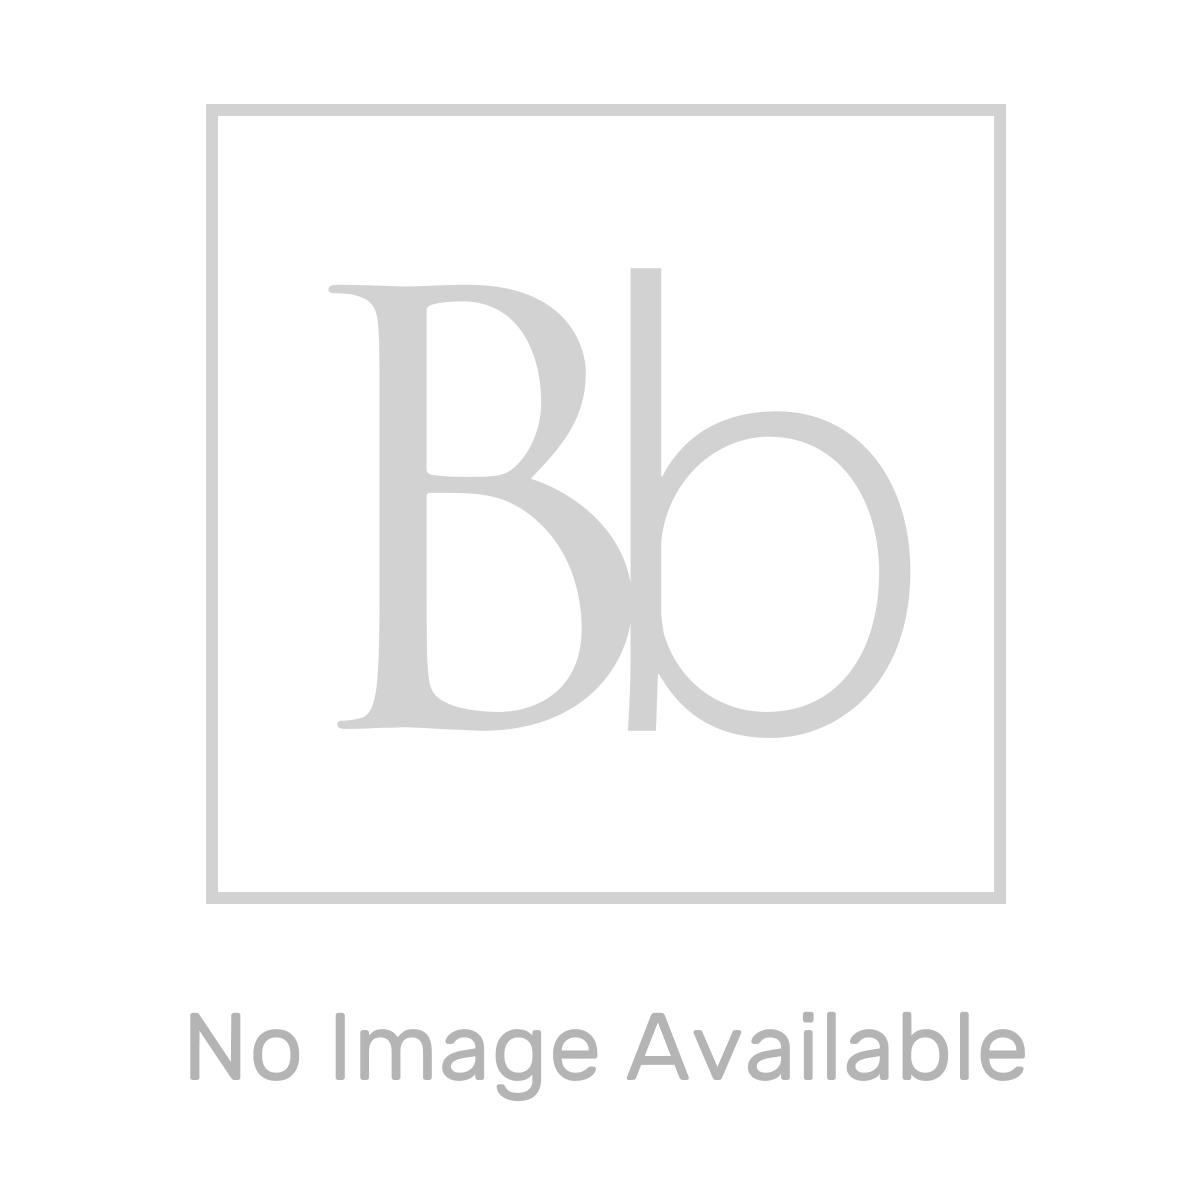 Kartell Impakt Single Door Base Unit 300mm Dimensions